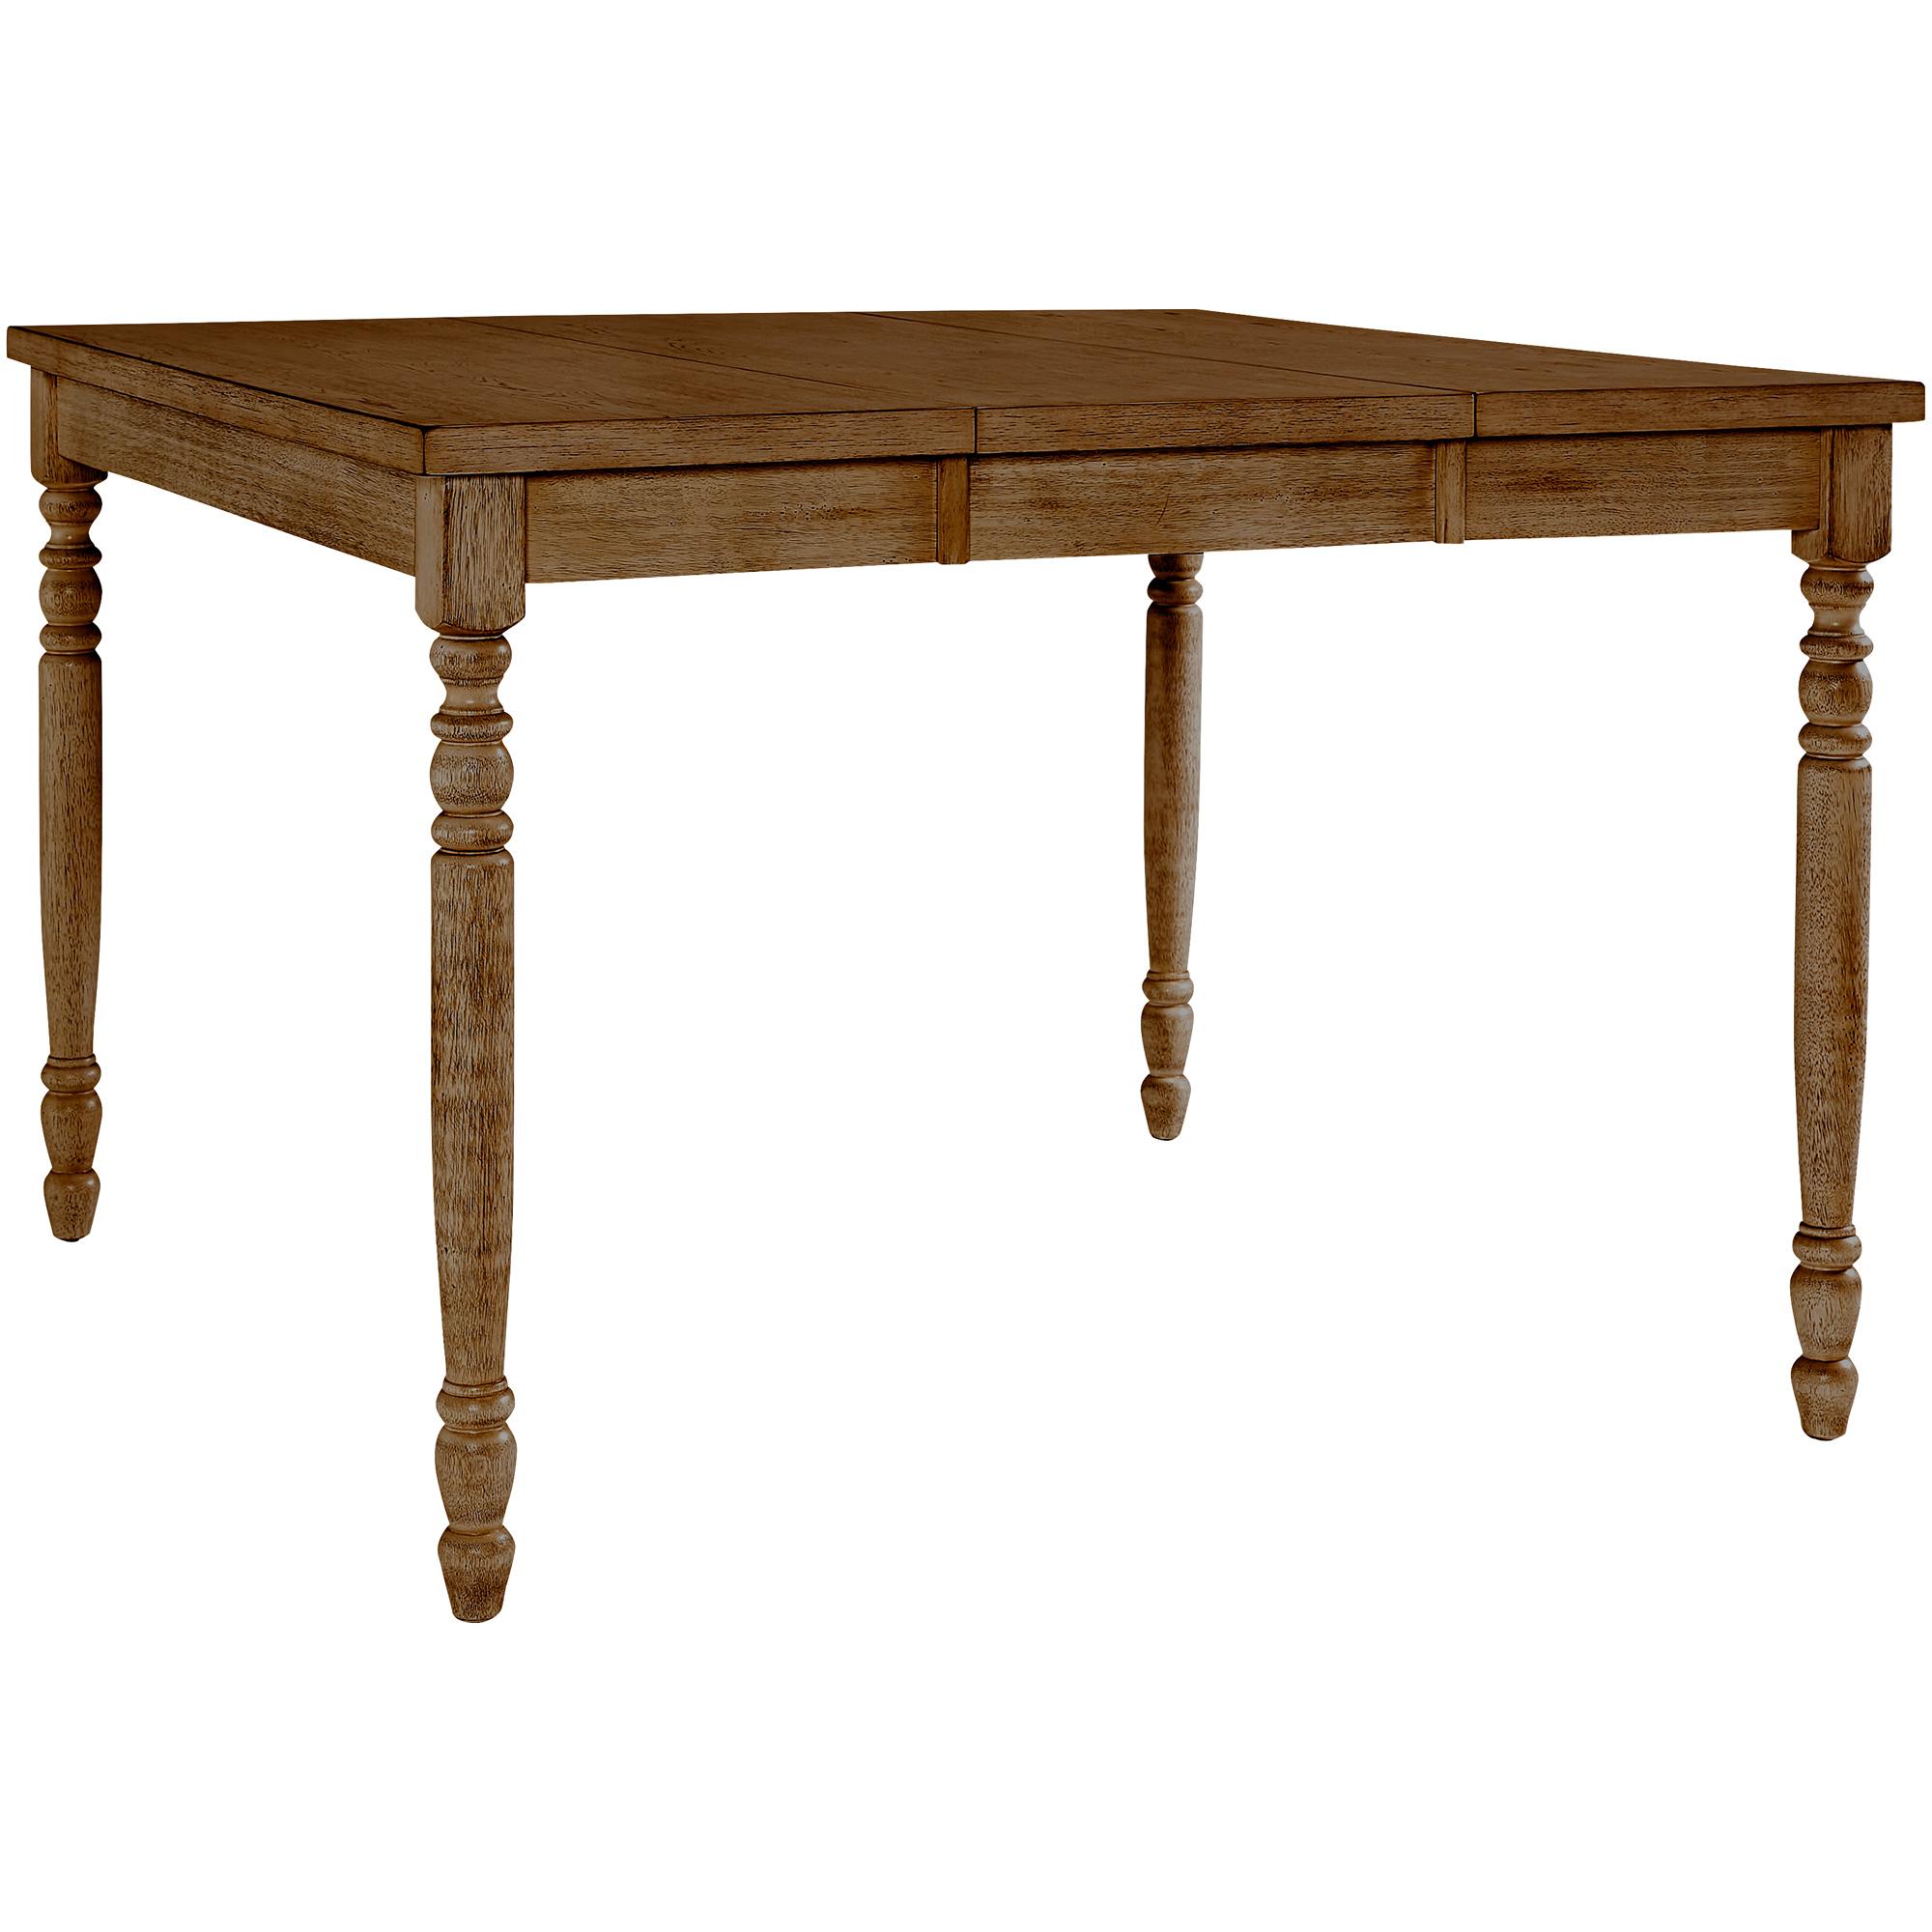 Progressive Furniture Inc. | Savannah Court Antique Oak Counter Table